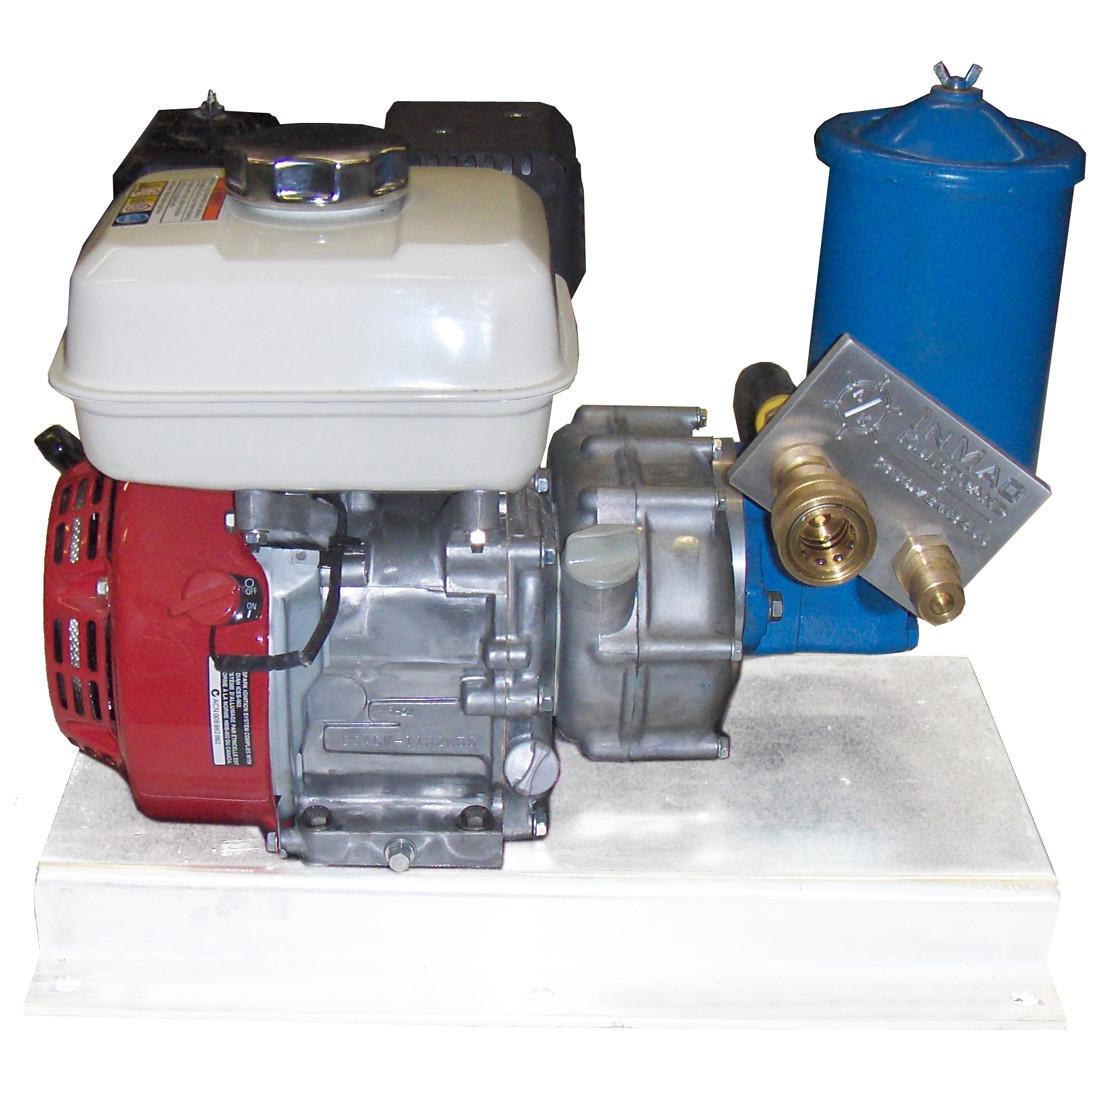 Akphonda 5 Inmac Kolstrand Honda Vtm Hydraulic Power Unit 5 H P With Base